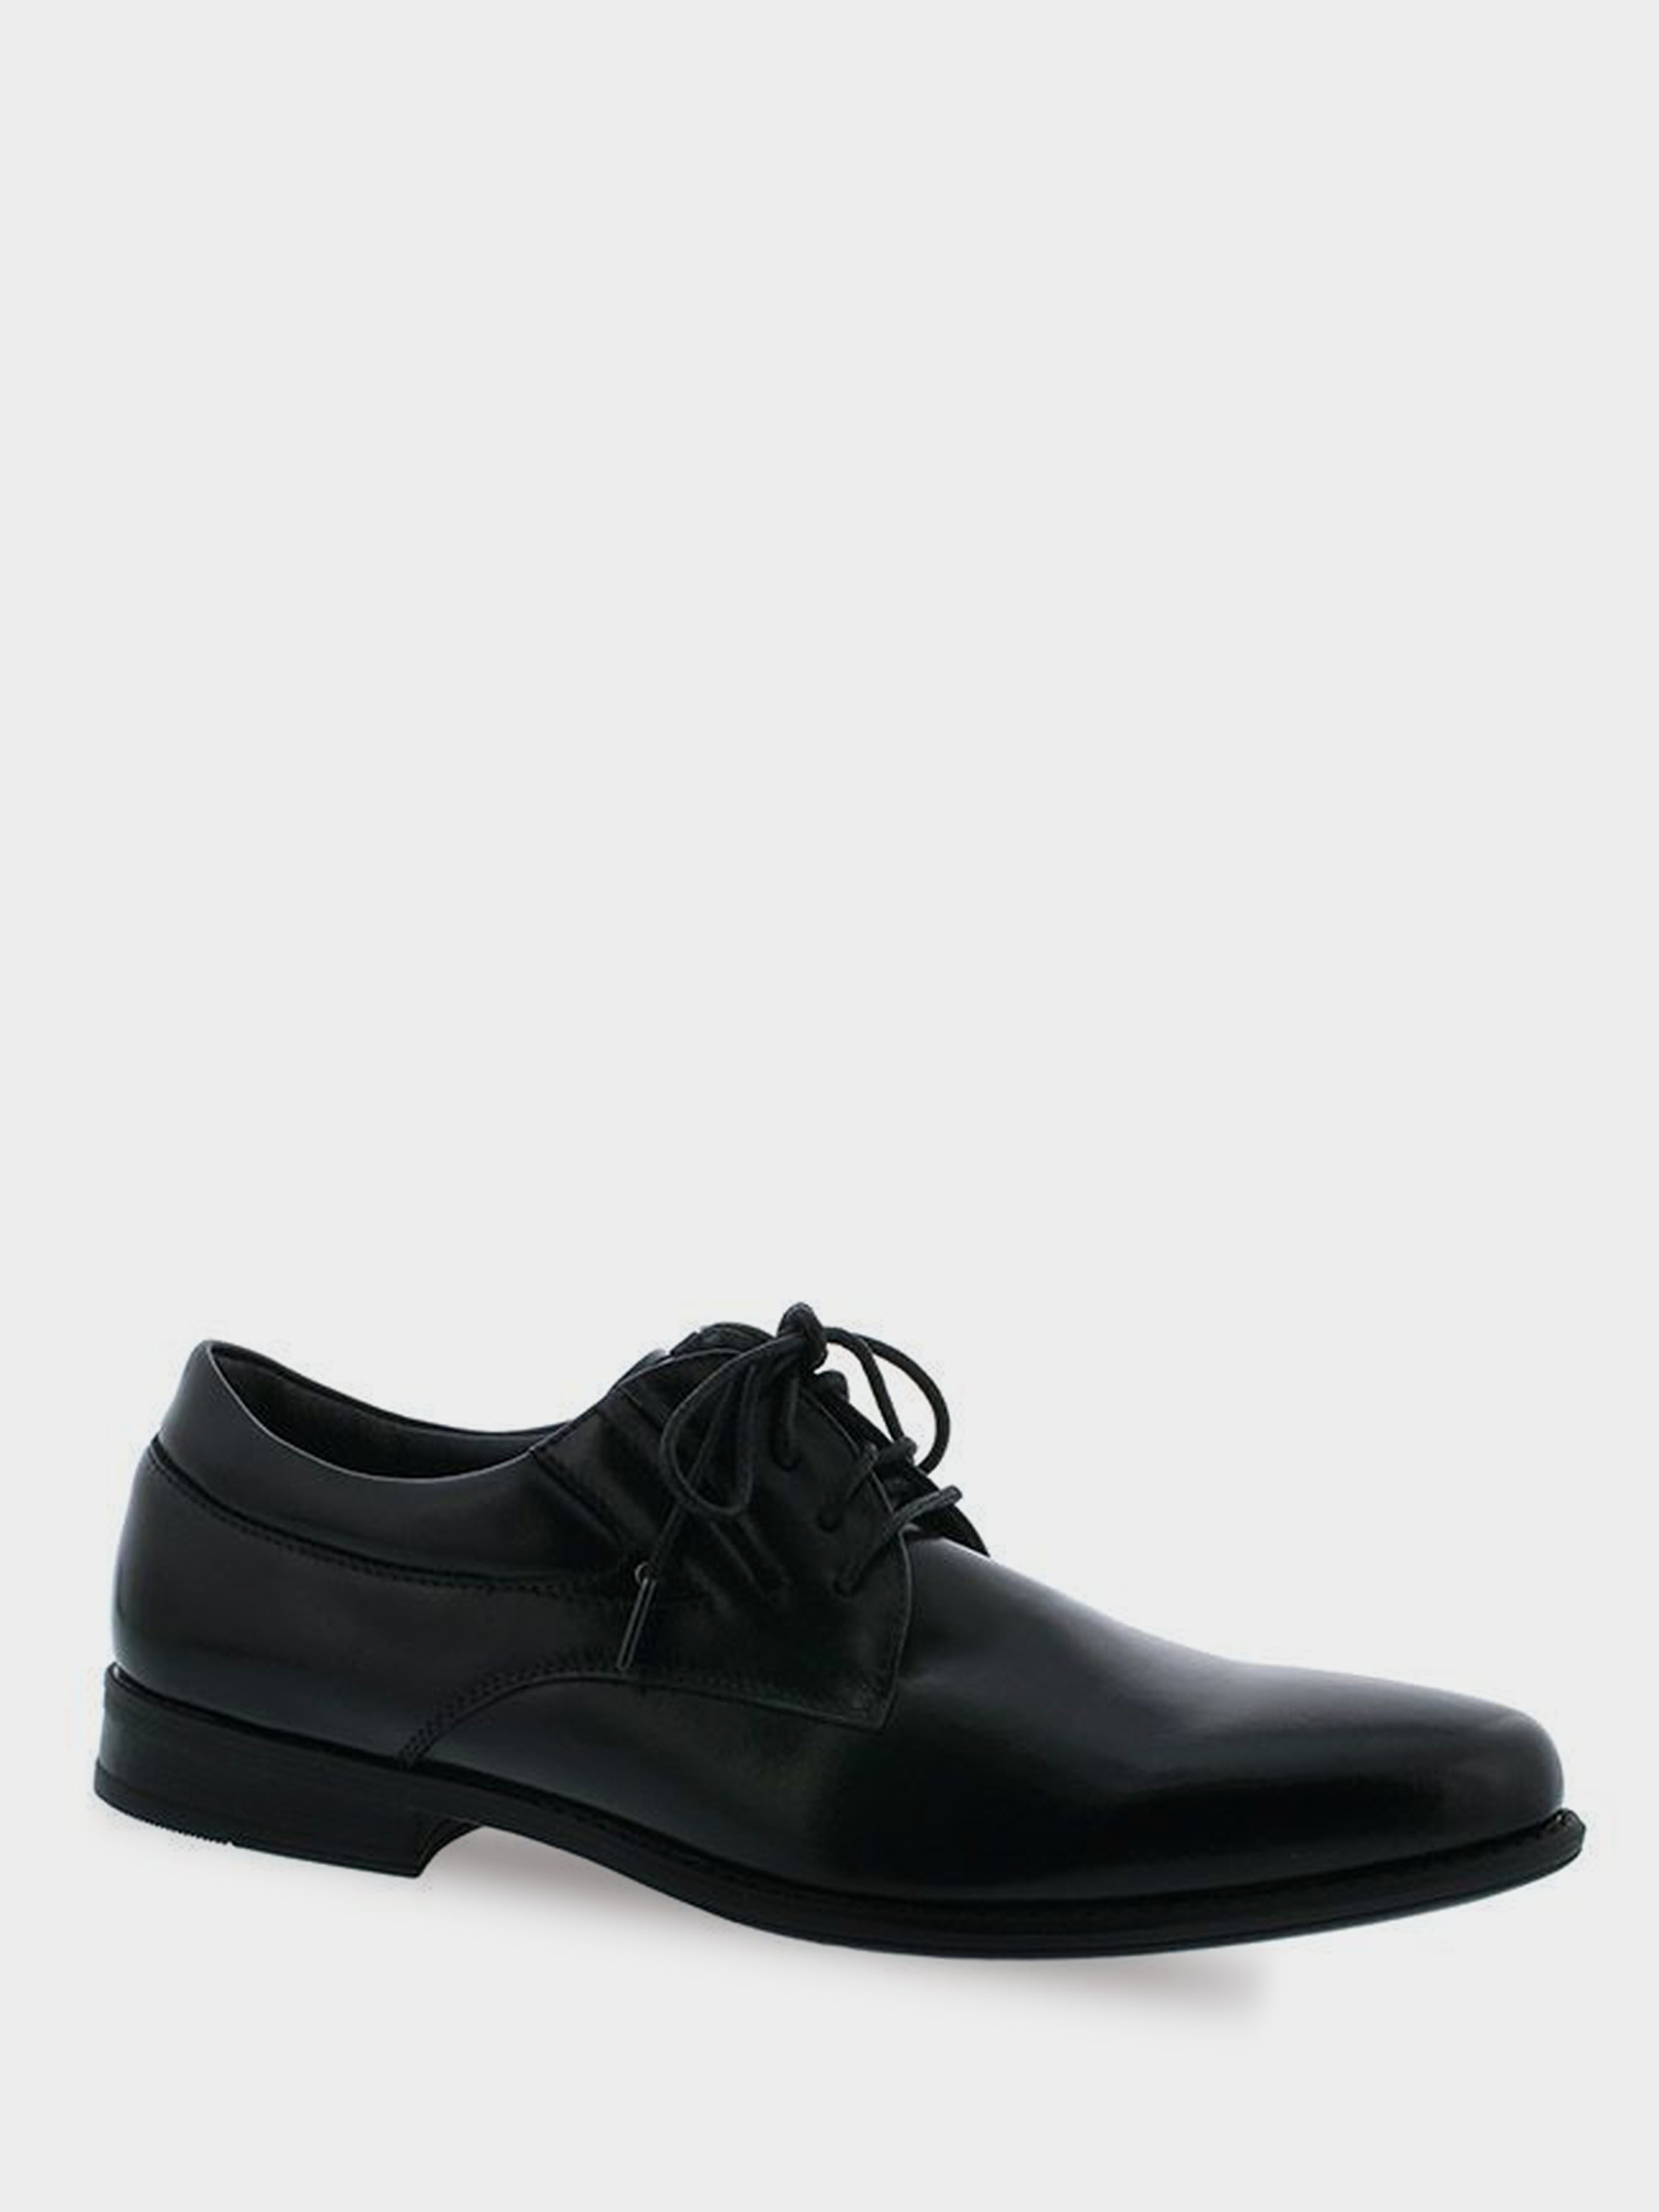 Полуботинки для мужчин RIEKER RK592 размеры обуви, 2017